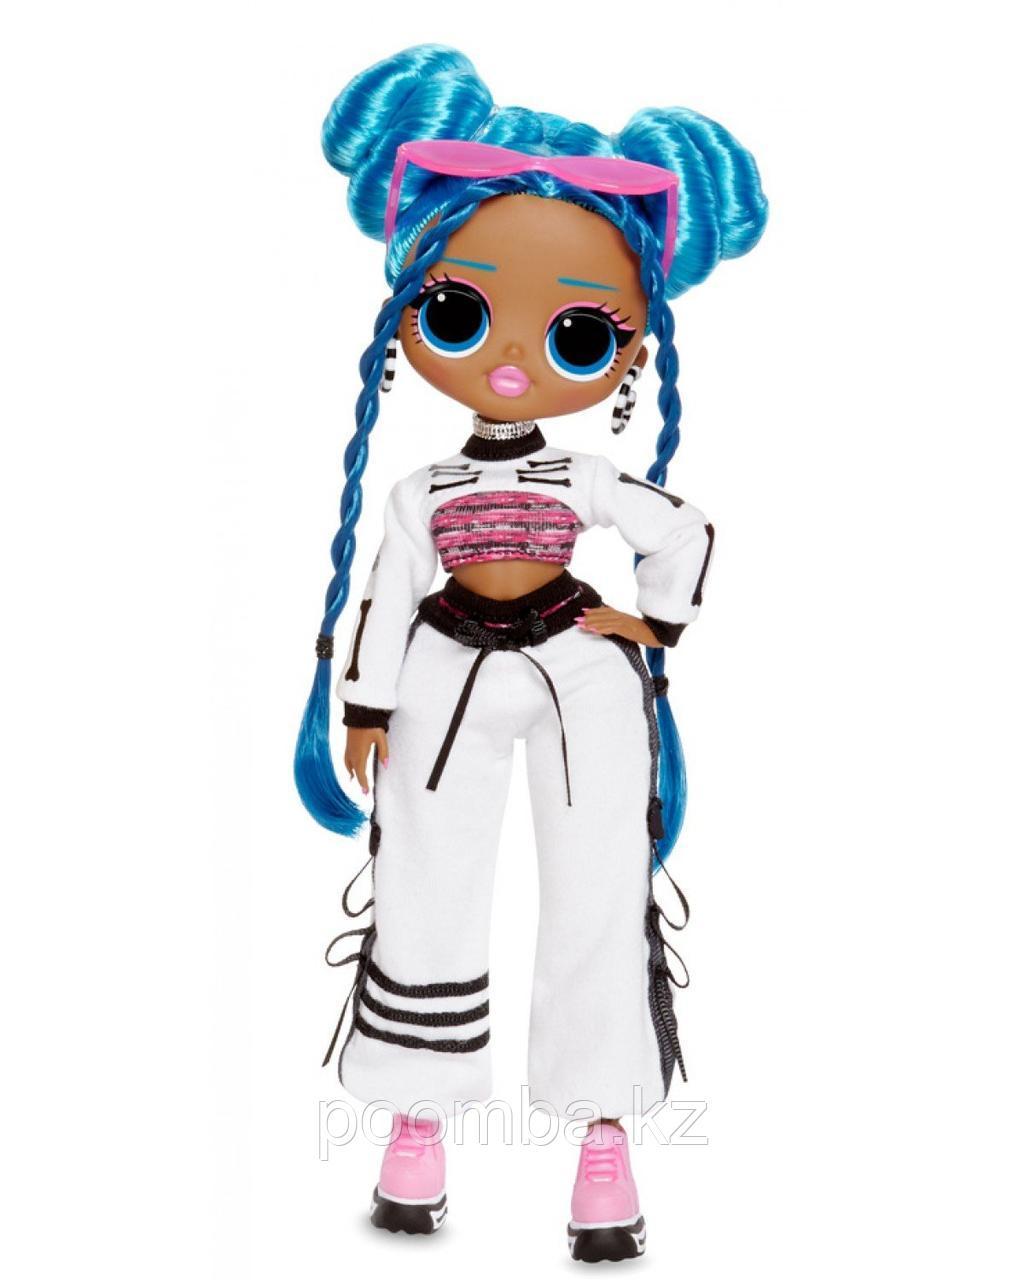 L.O.L. Кукла OMG 3 серия - Chillax - фото 1